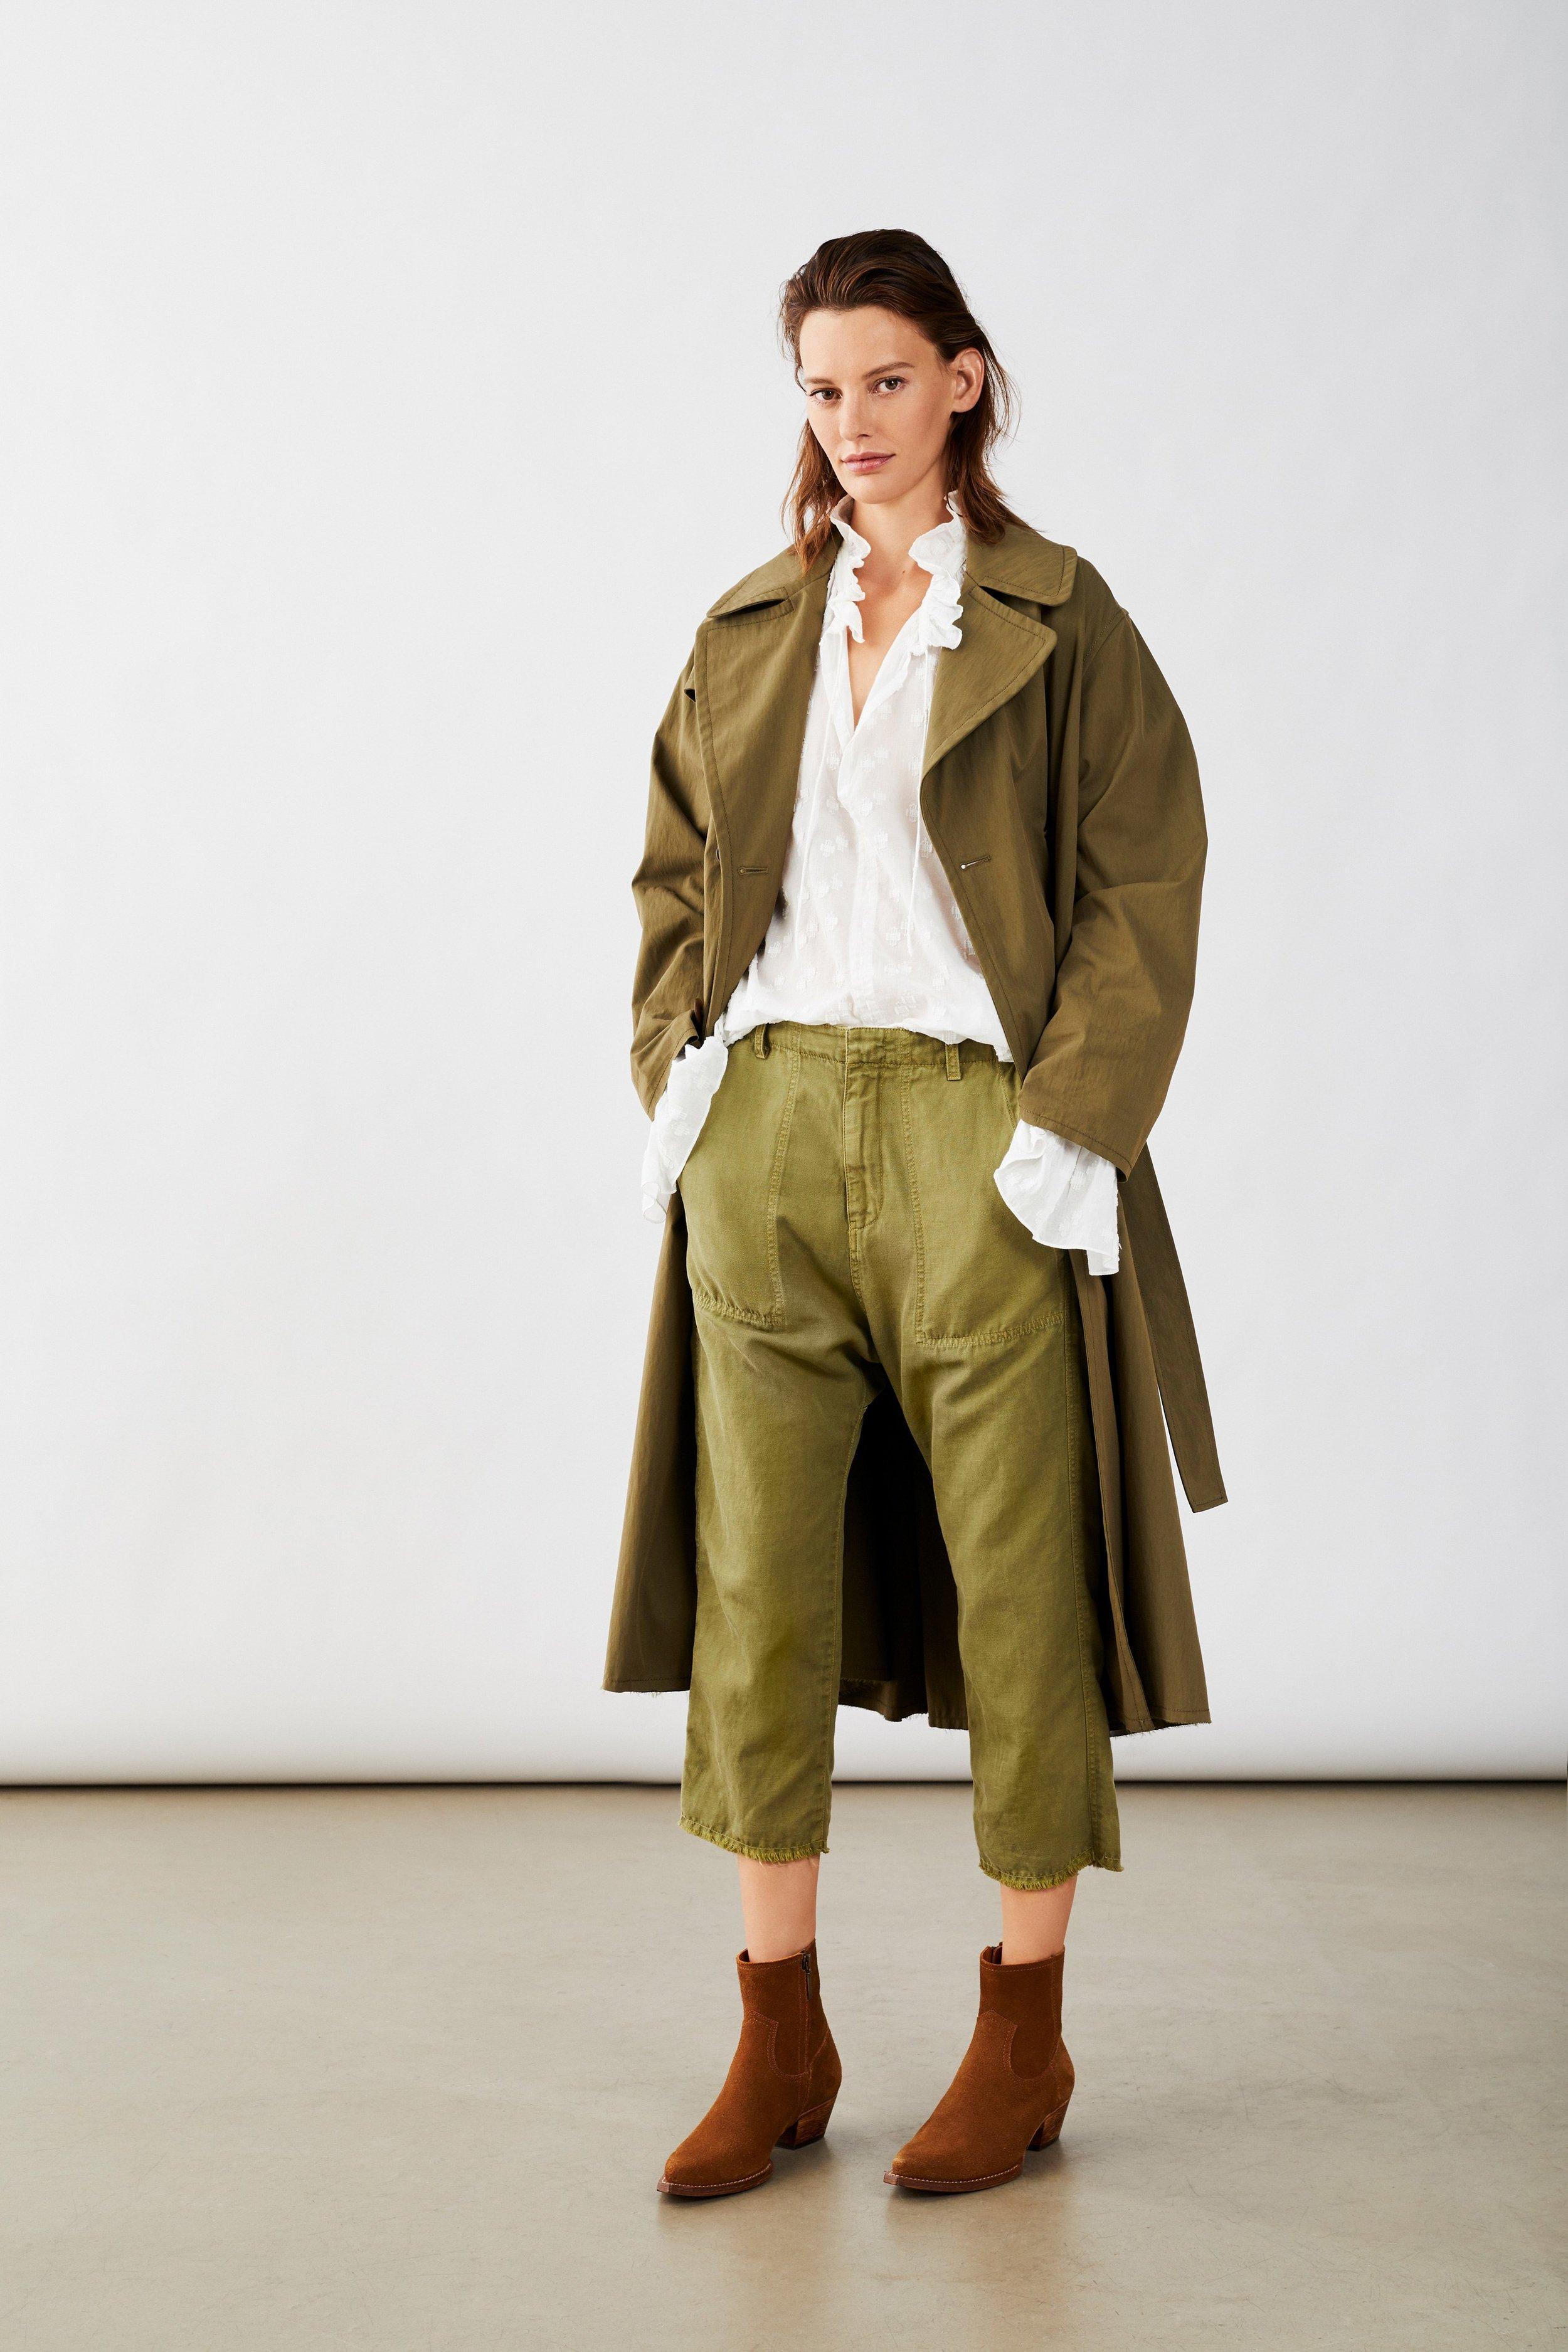 00018-nili-lotan-collection-spring-2019-ready-to-wear.jpg